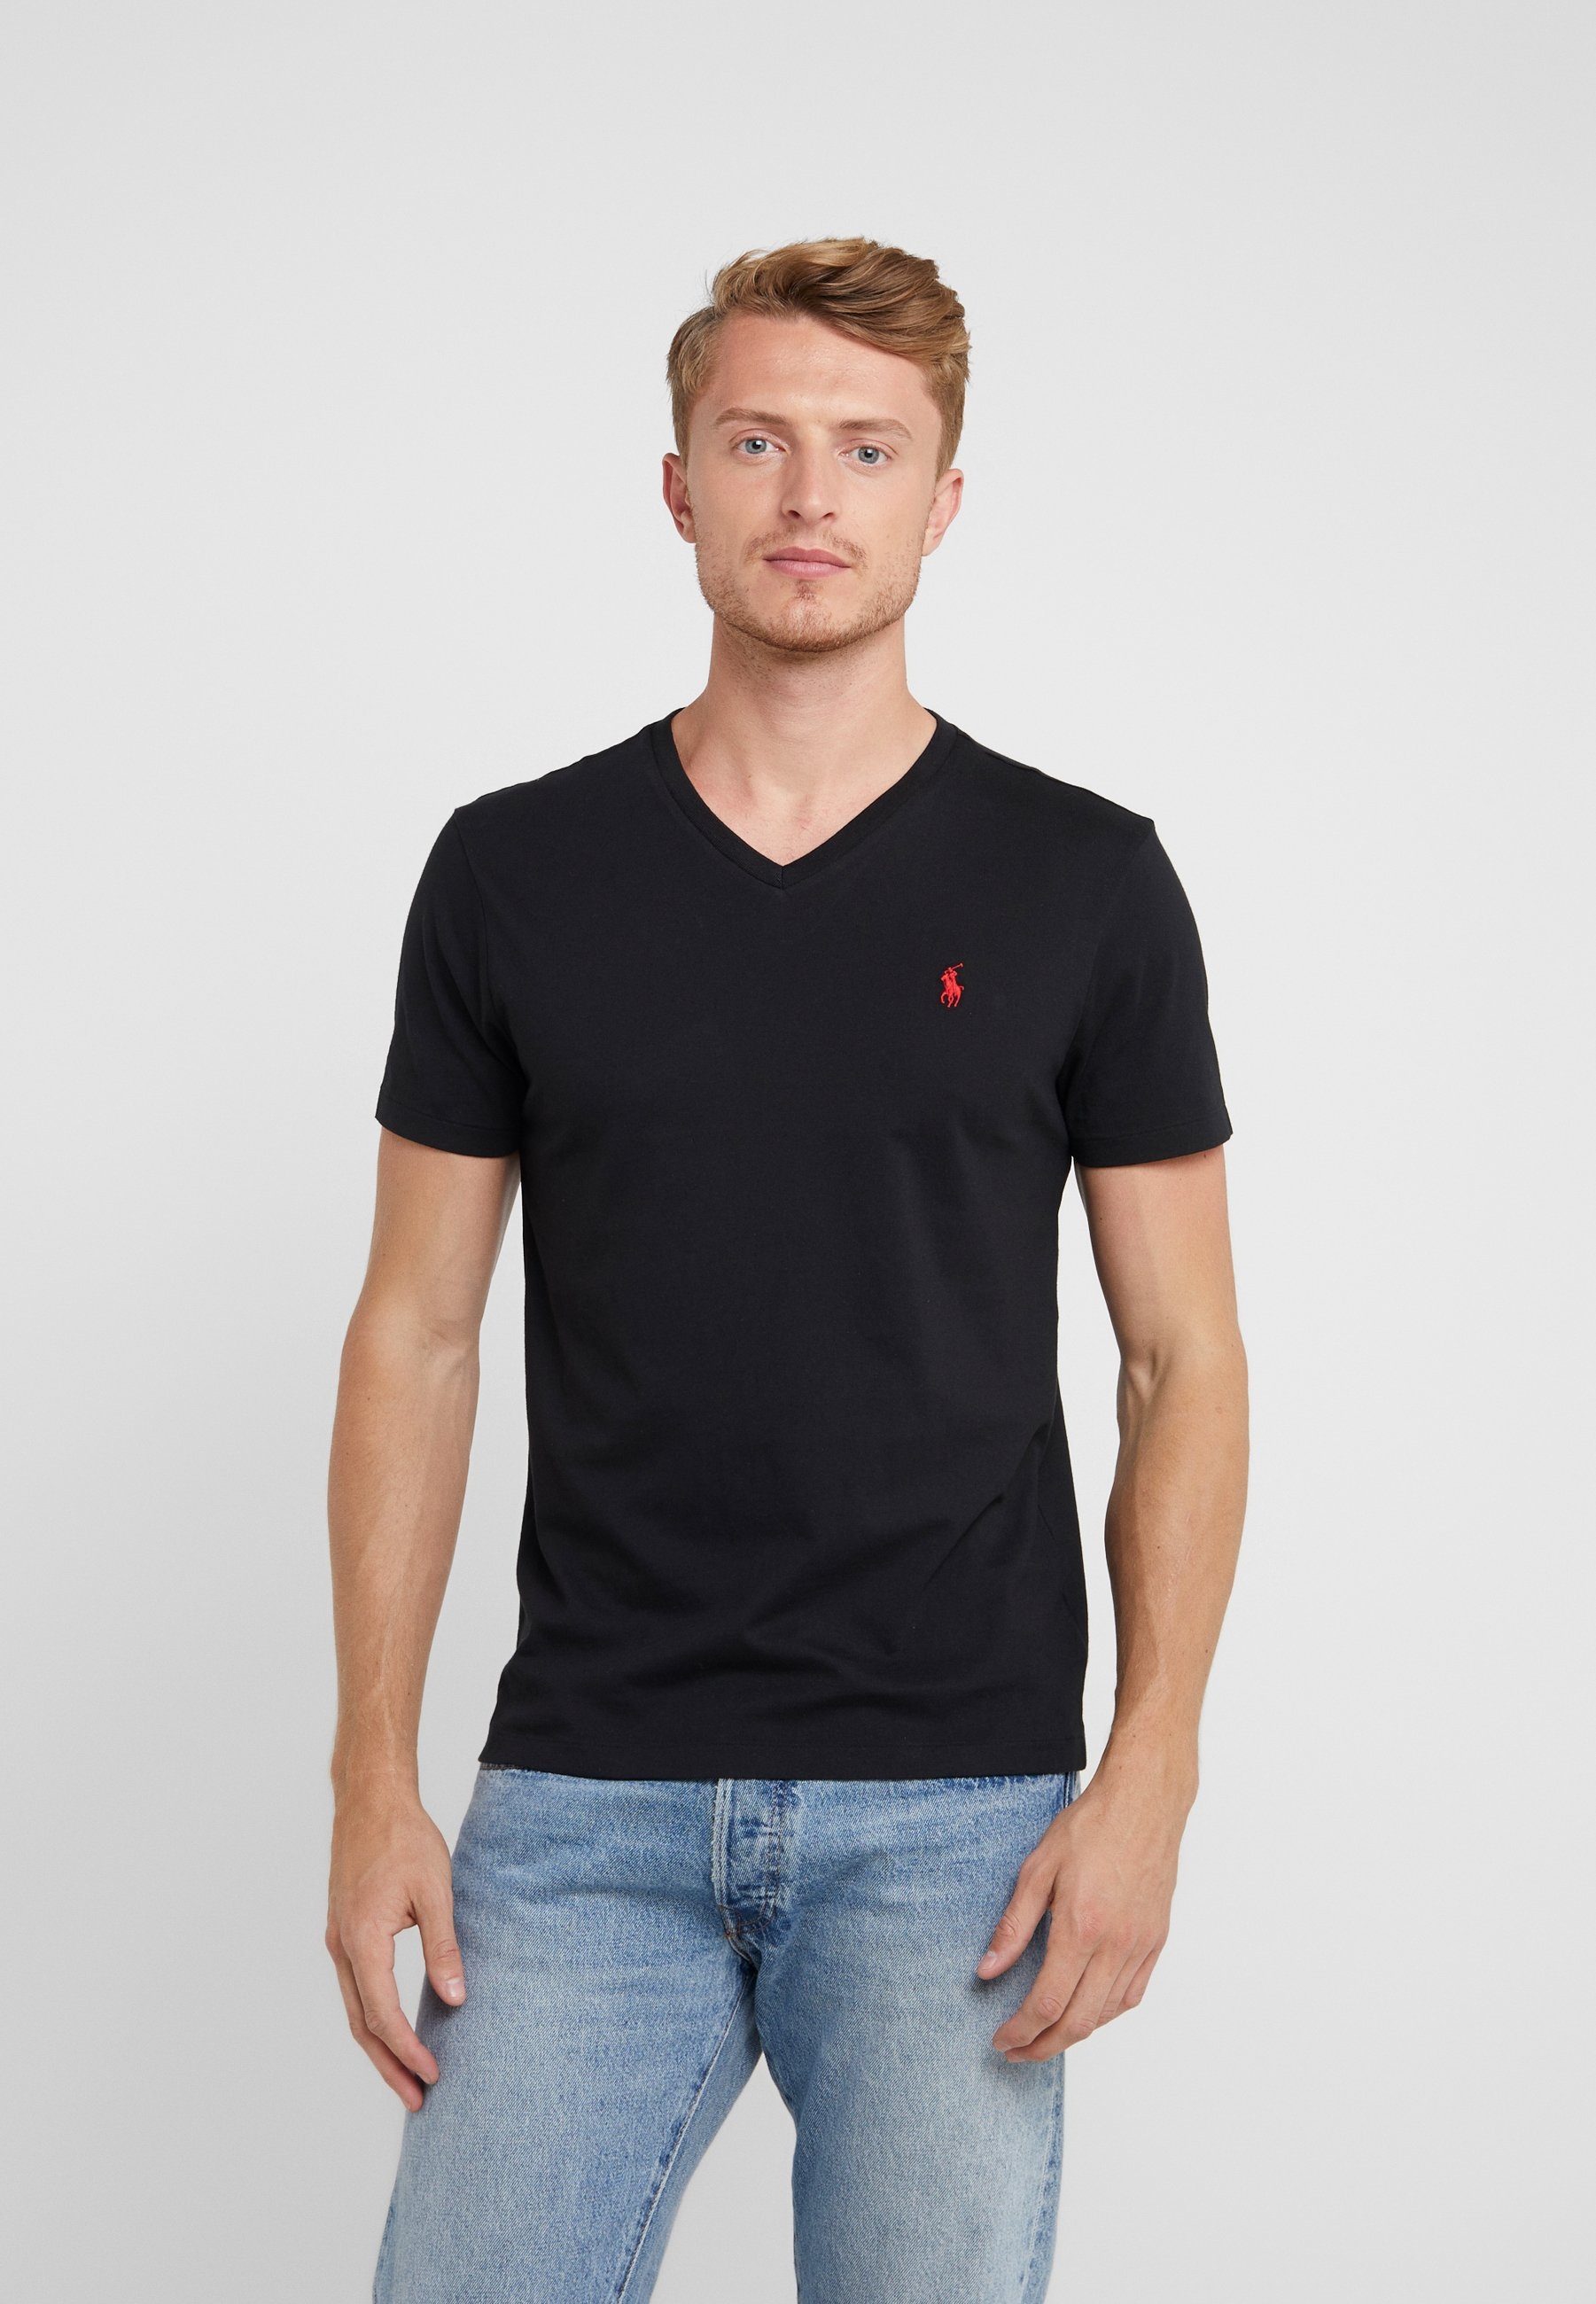 Men CUSTOM SLIM FIT JERSEY V-NECK T-SHIRT - Basic T-shirt